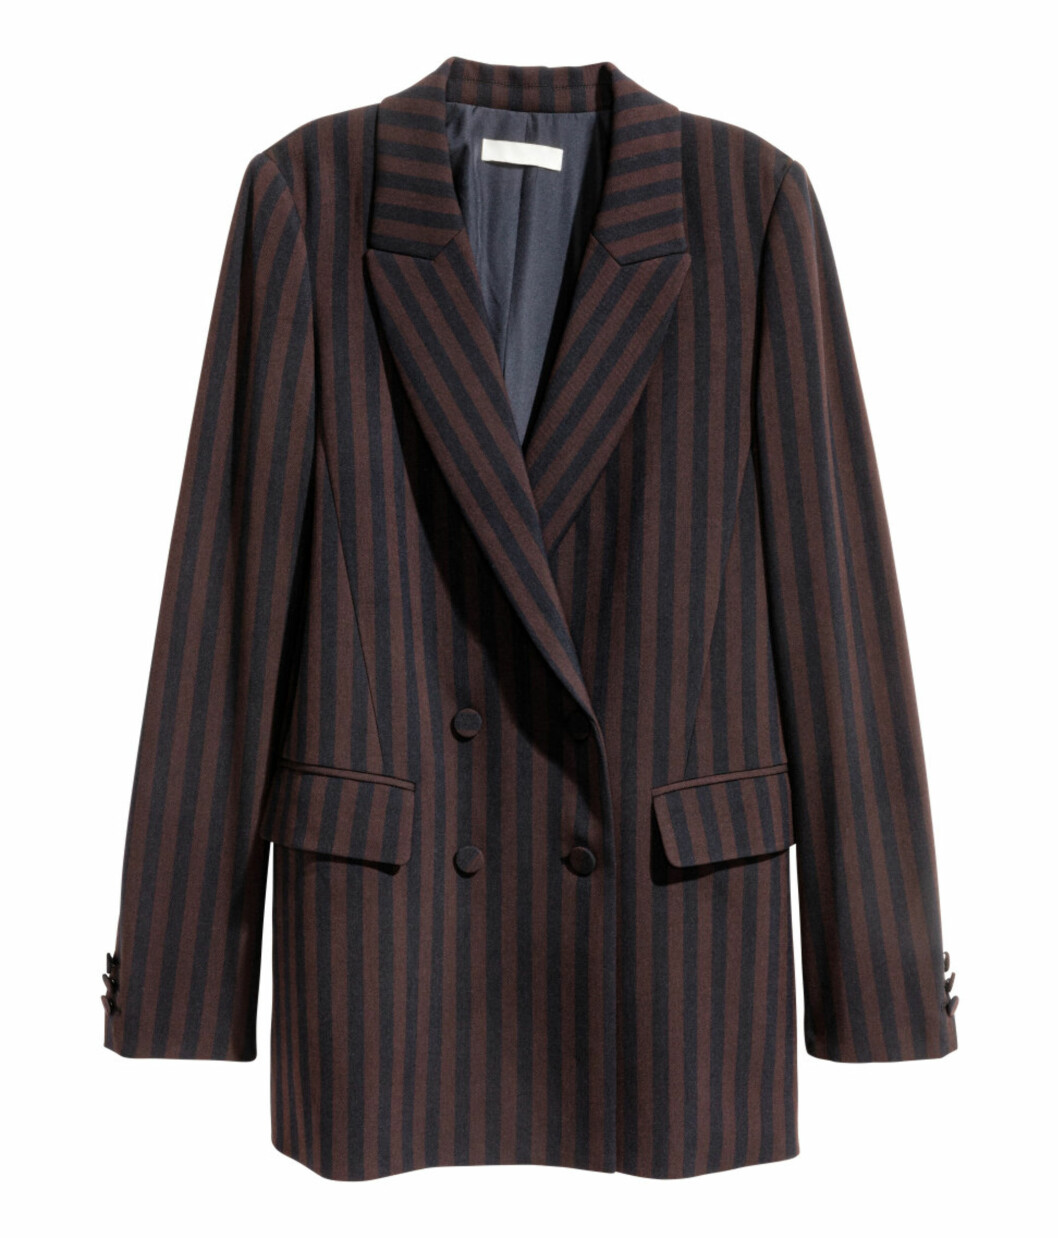 Dobbeltspent blazer fra H&M | kr 399 | http://www.hm.com/no/product/56282?article=56282-A